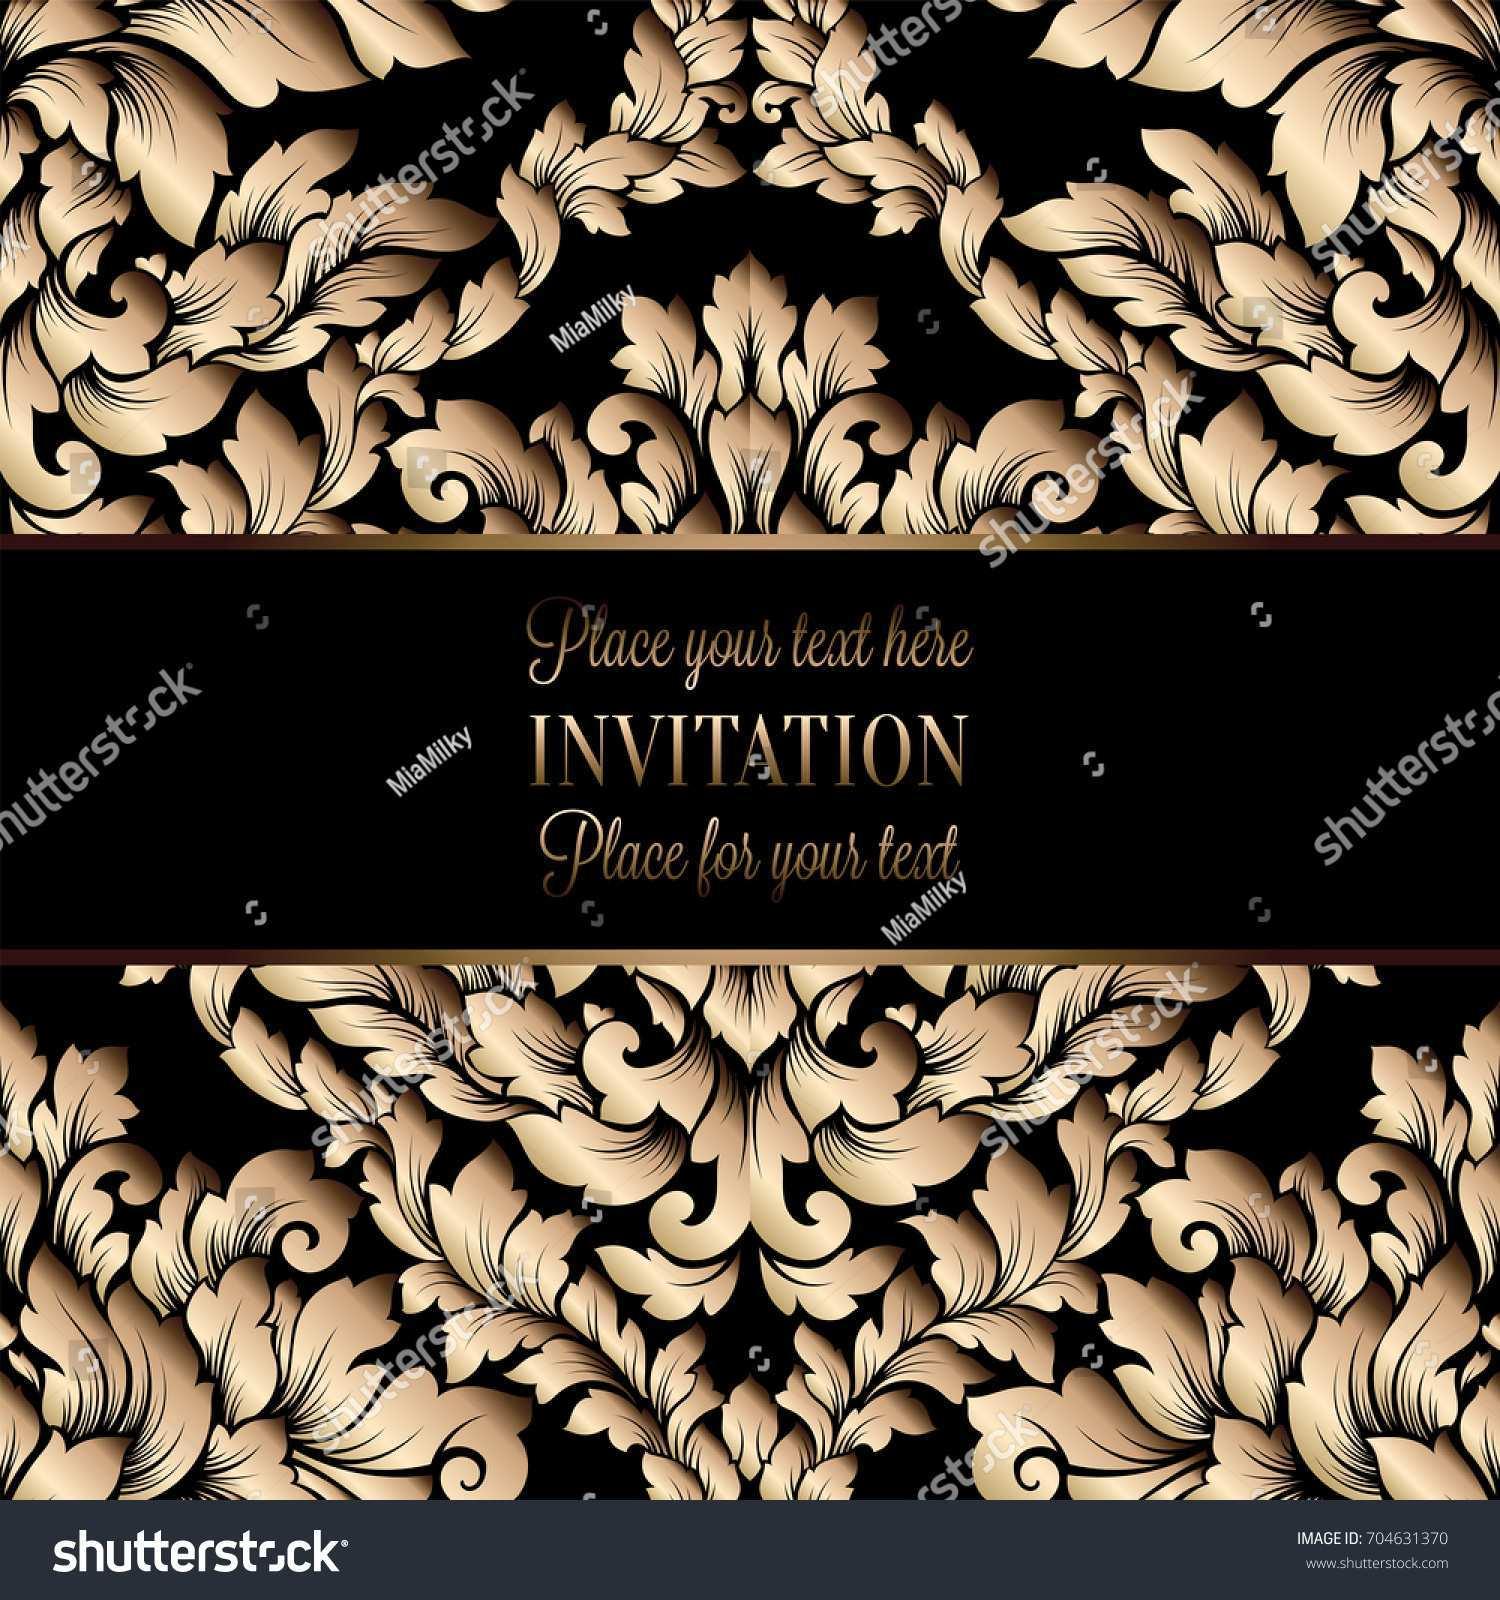 5 Blank Vector Invitation Template Java Photo by Vector